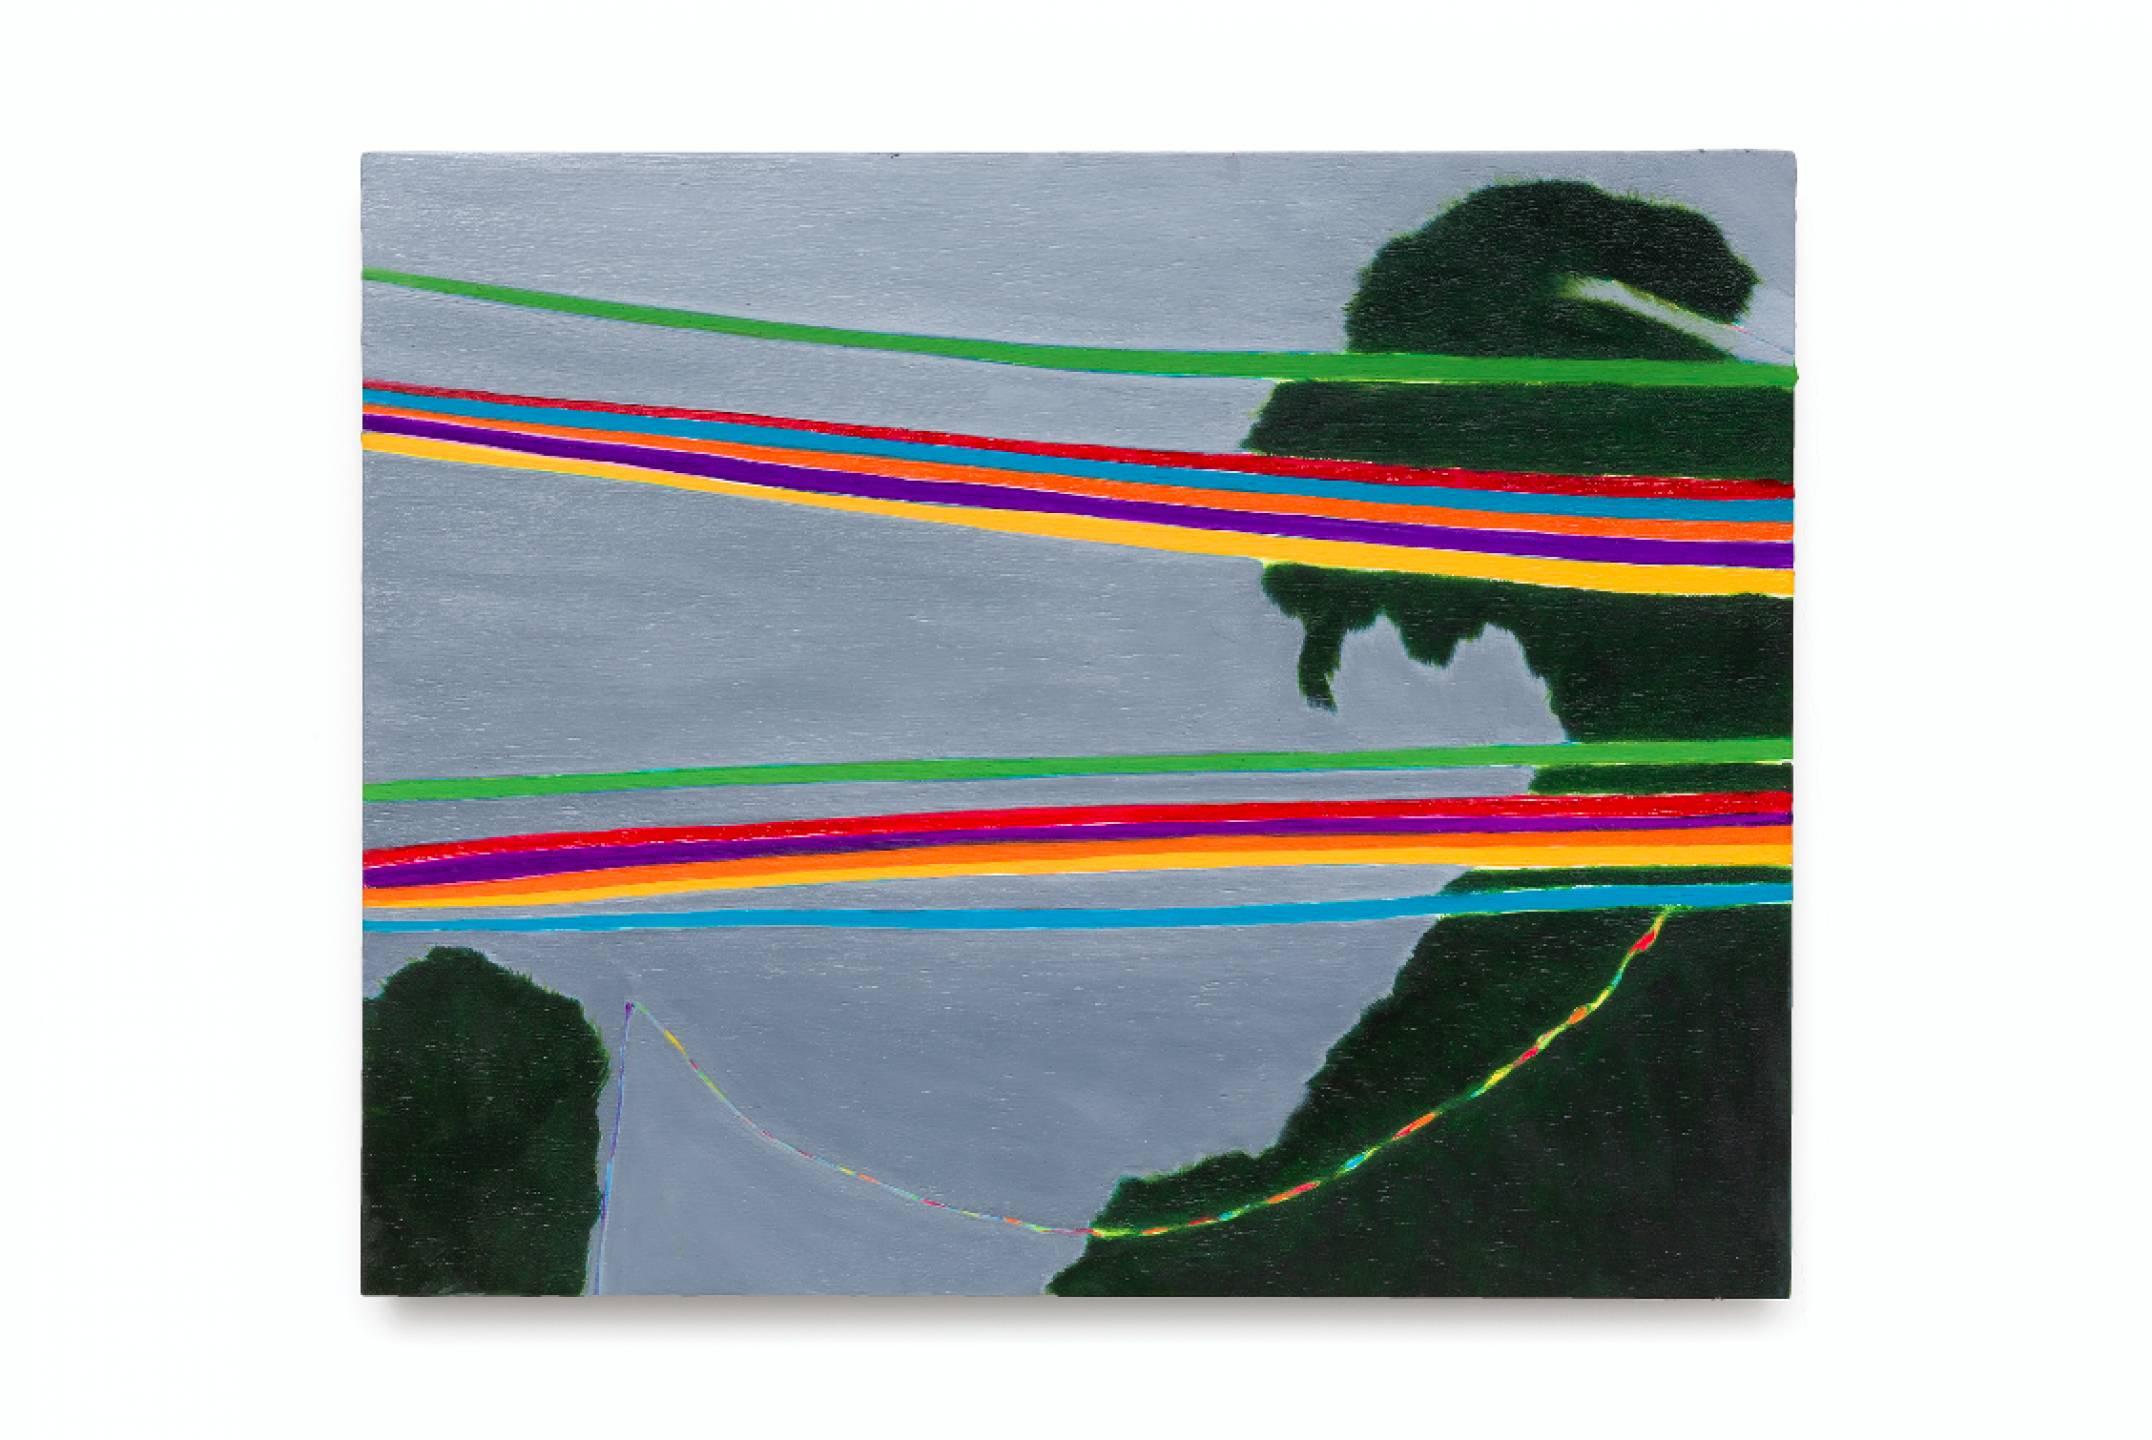 Patricia Leite,<em>Festa no interior</em>, 2015, oil on wood, 40 ×50 cm - Mendes Wood DM